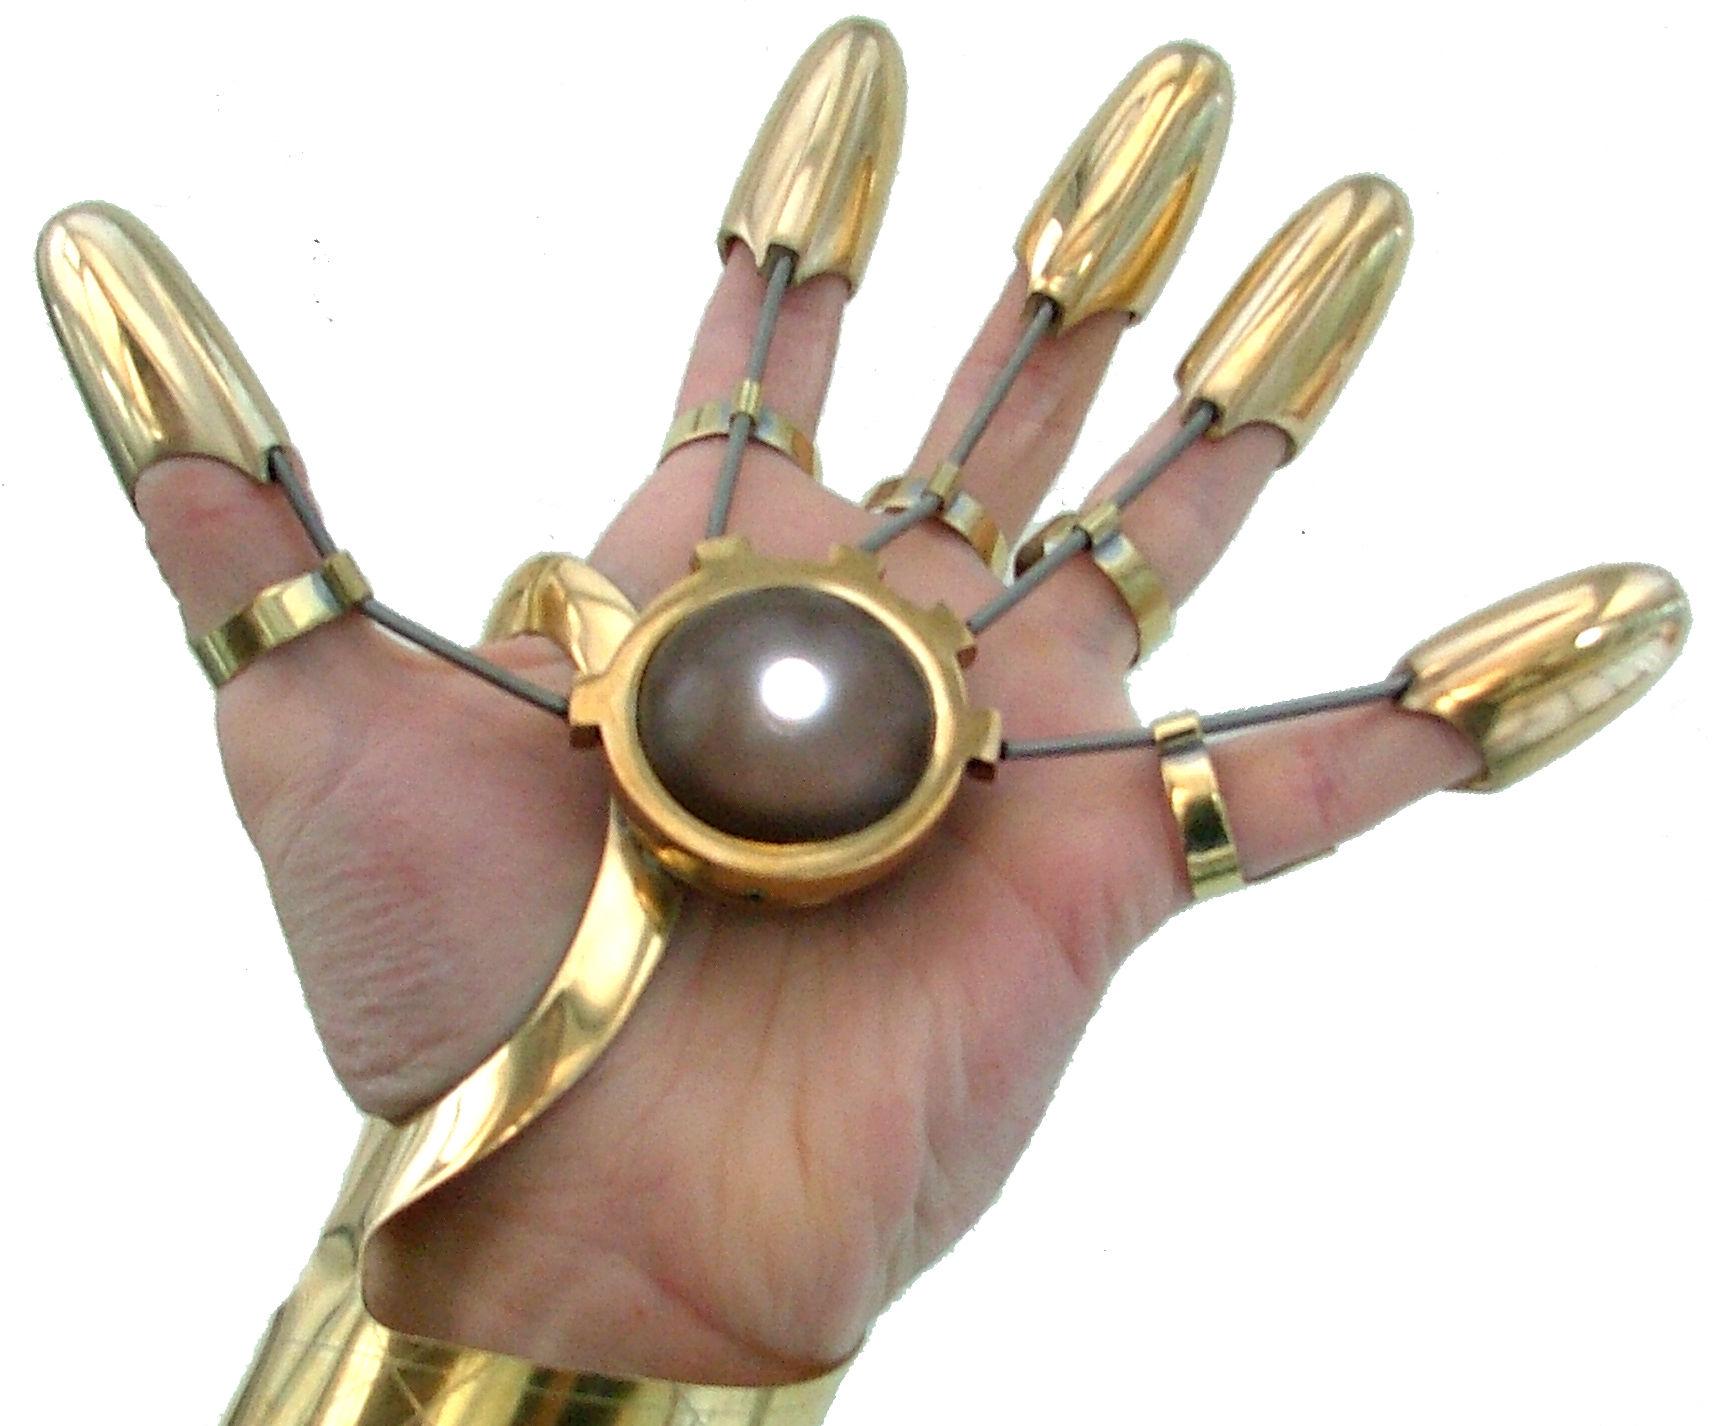 Stargate Ribbon Device Prop Replica